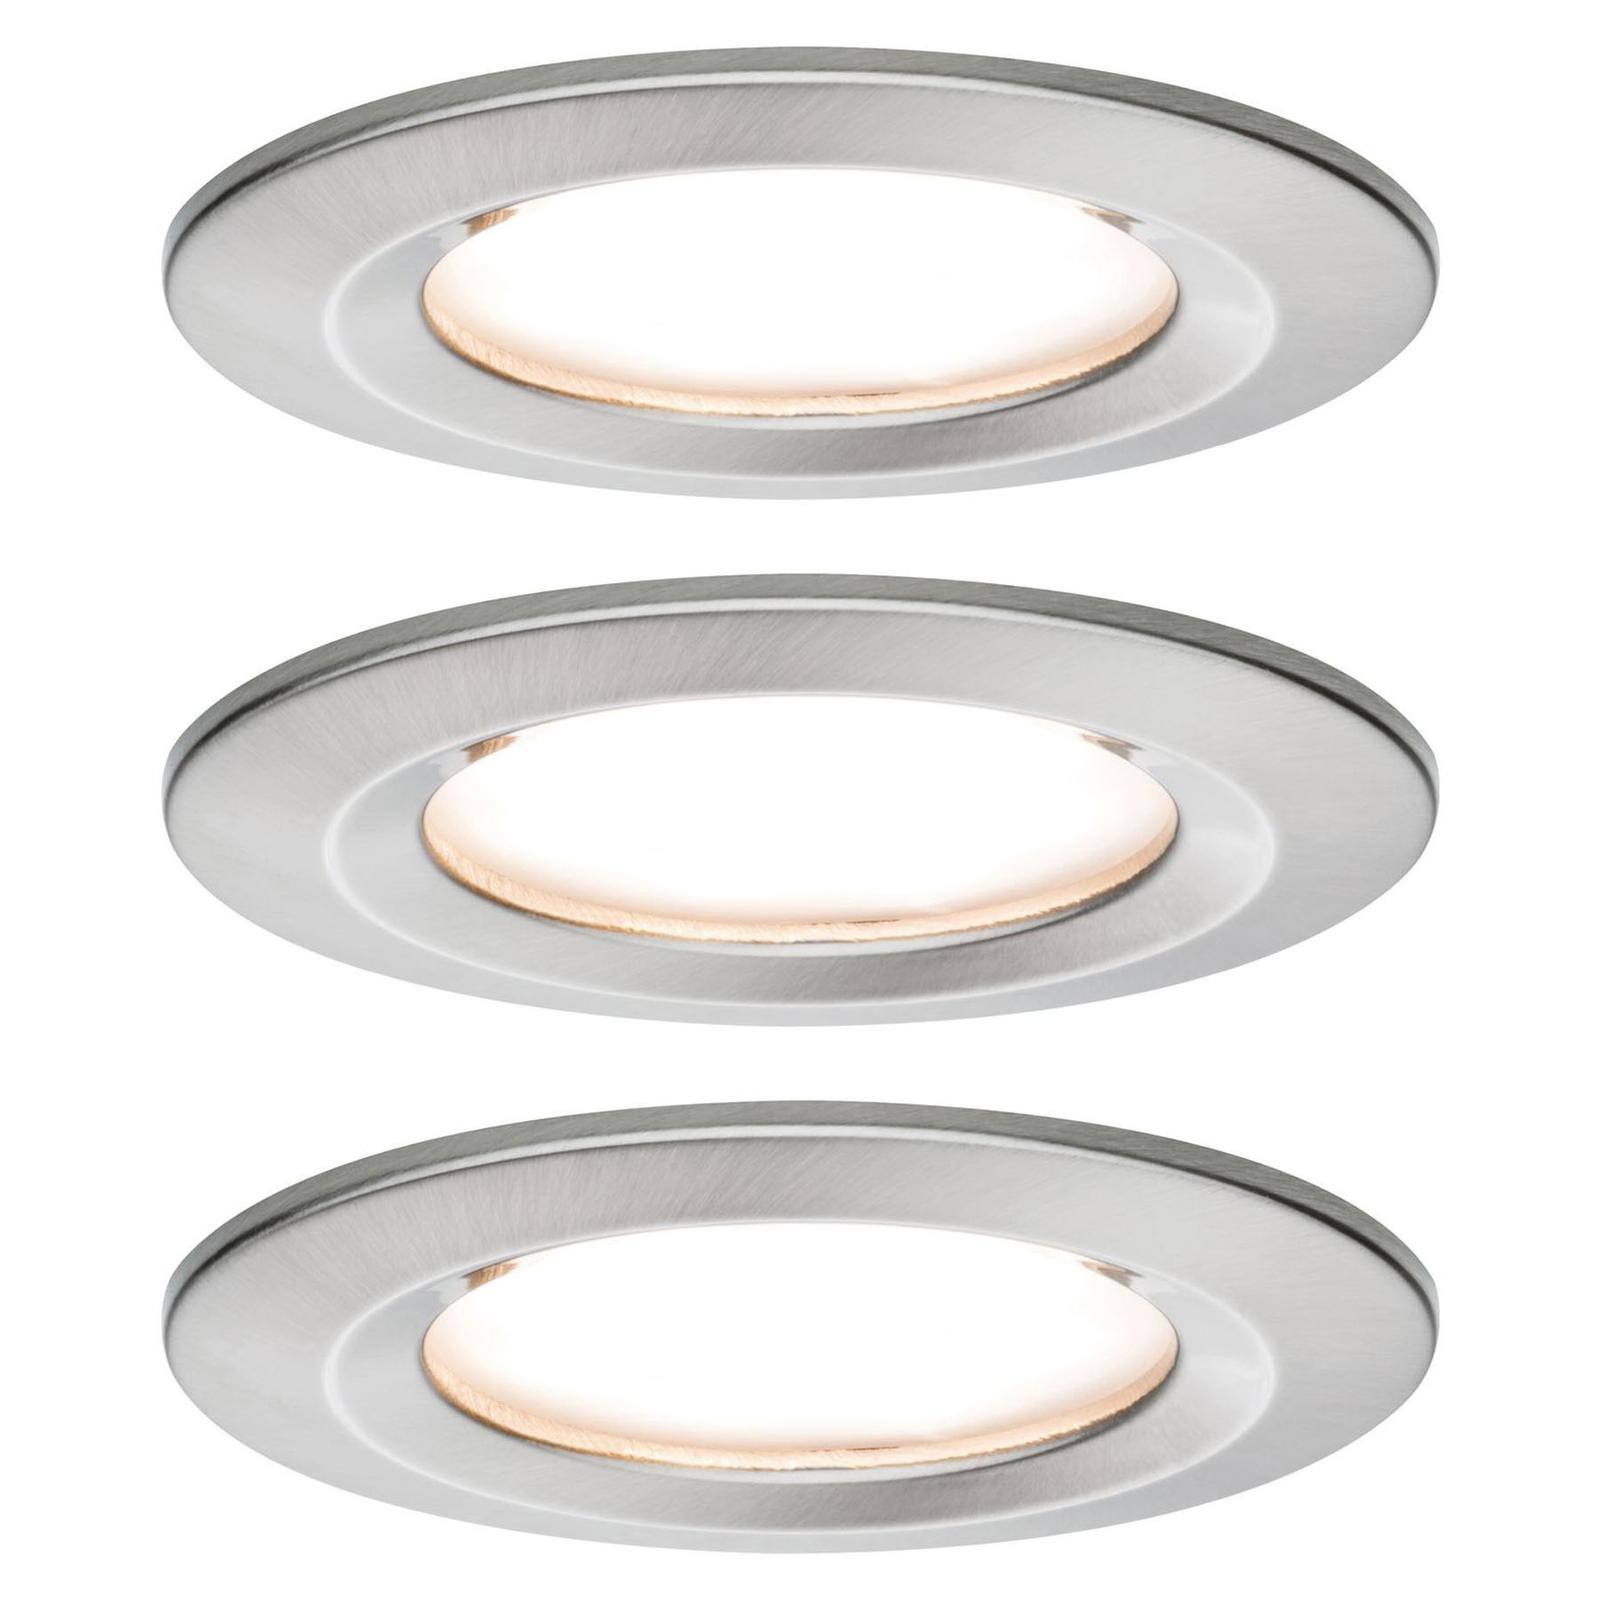 Paulmann Nova LED-inbyggnadsspot 3-pack stel, järn